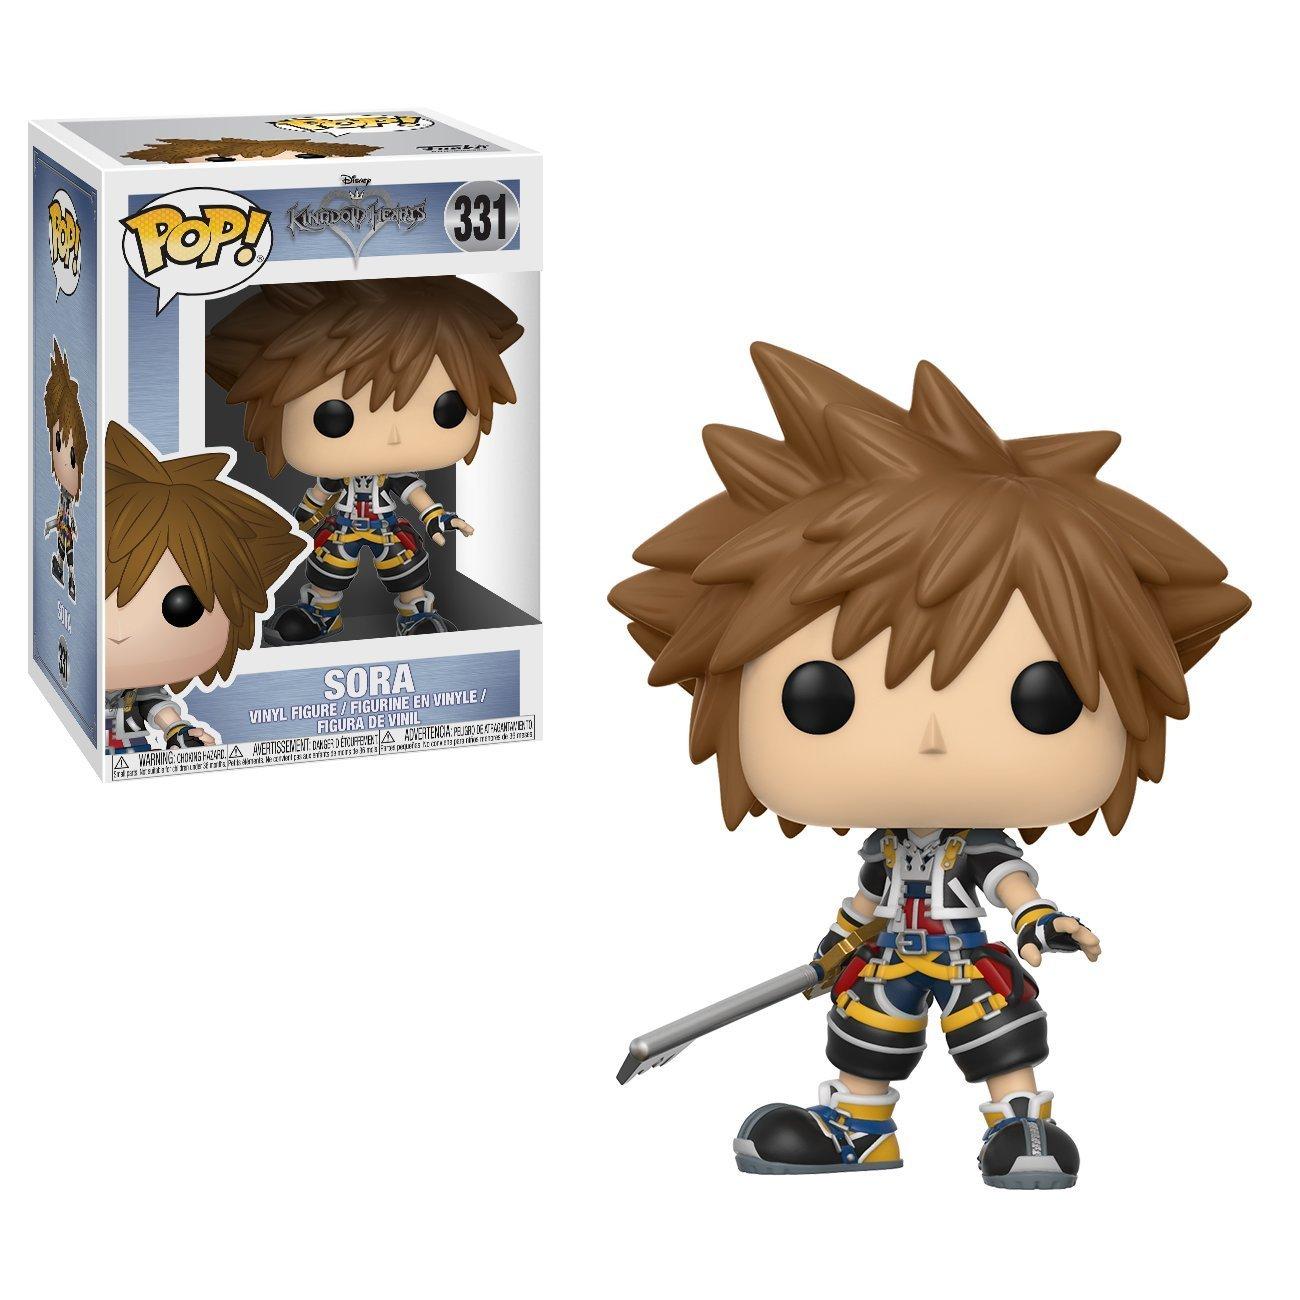 Funko POP! Kingdom Hearts: Sora imagen